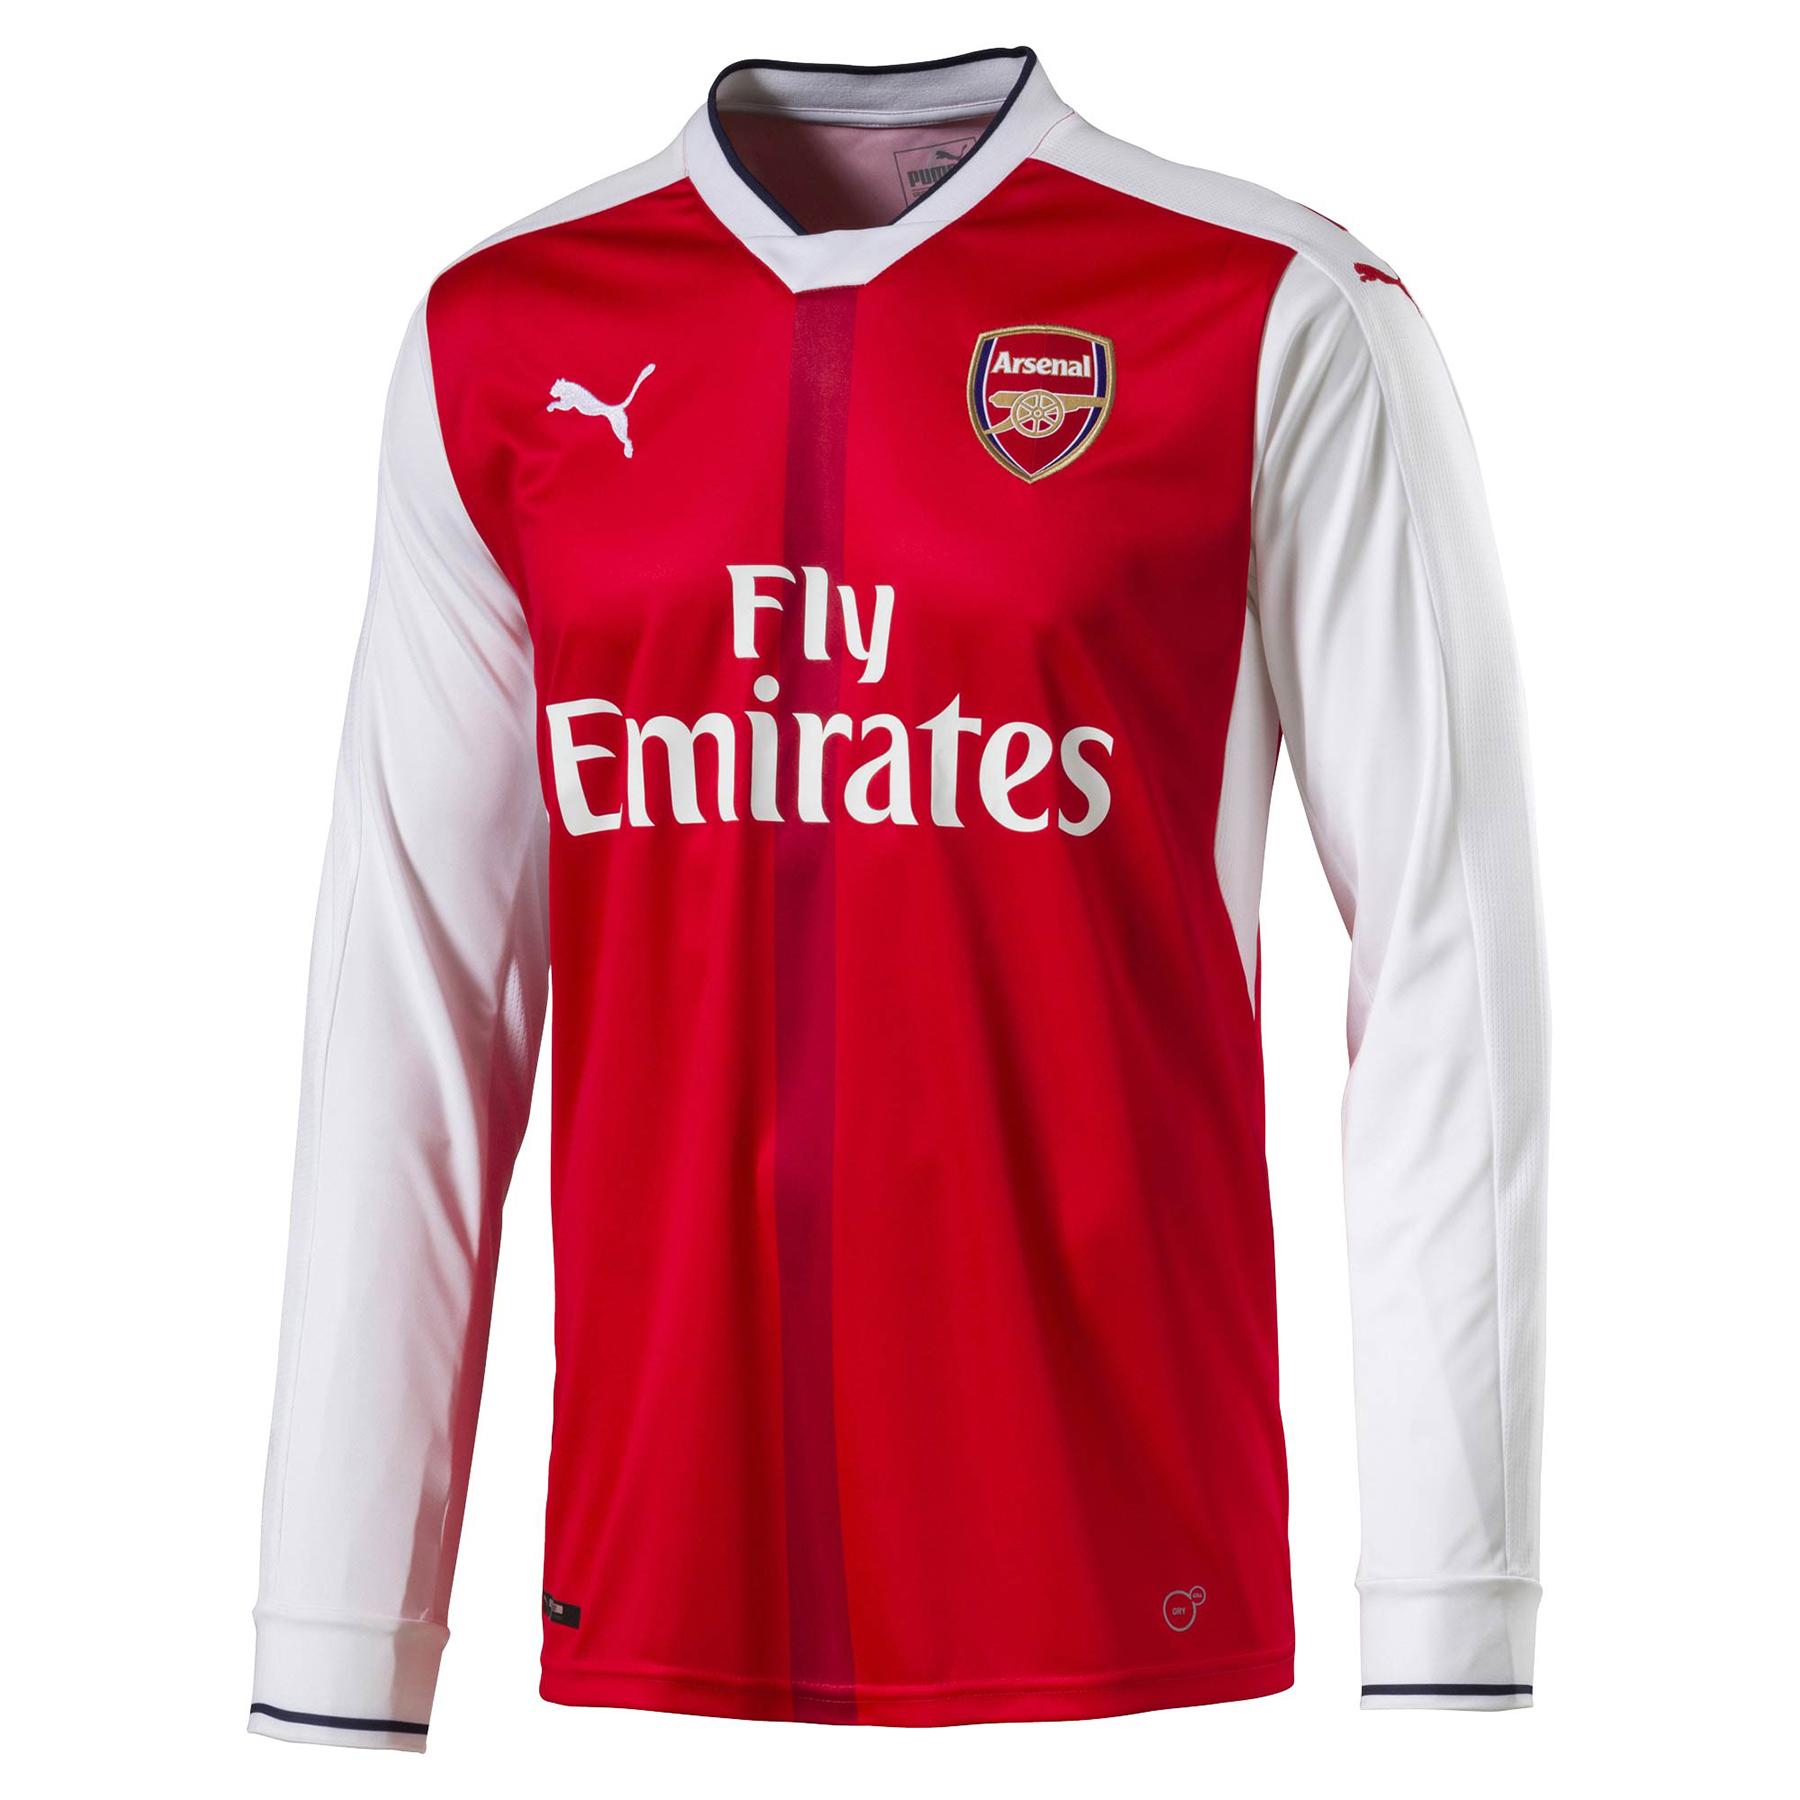 Arsenal Home Shirt 2016-17 - Long Sleeve - Kids, Red